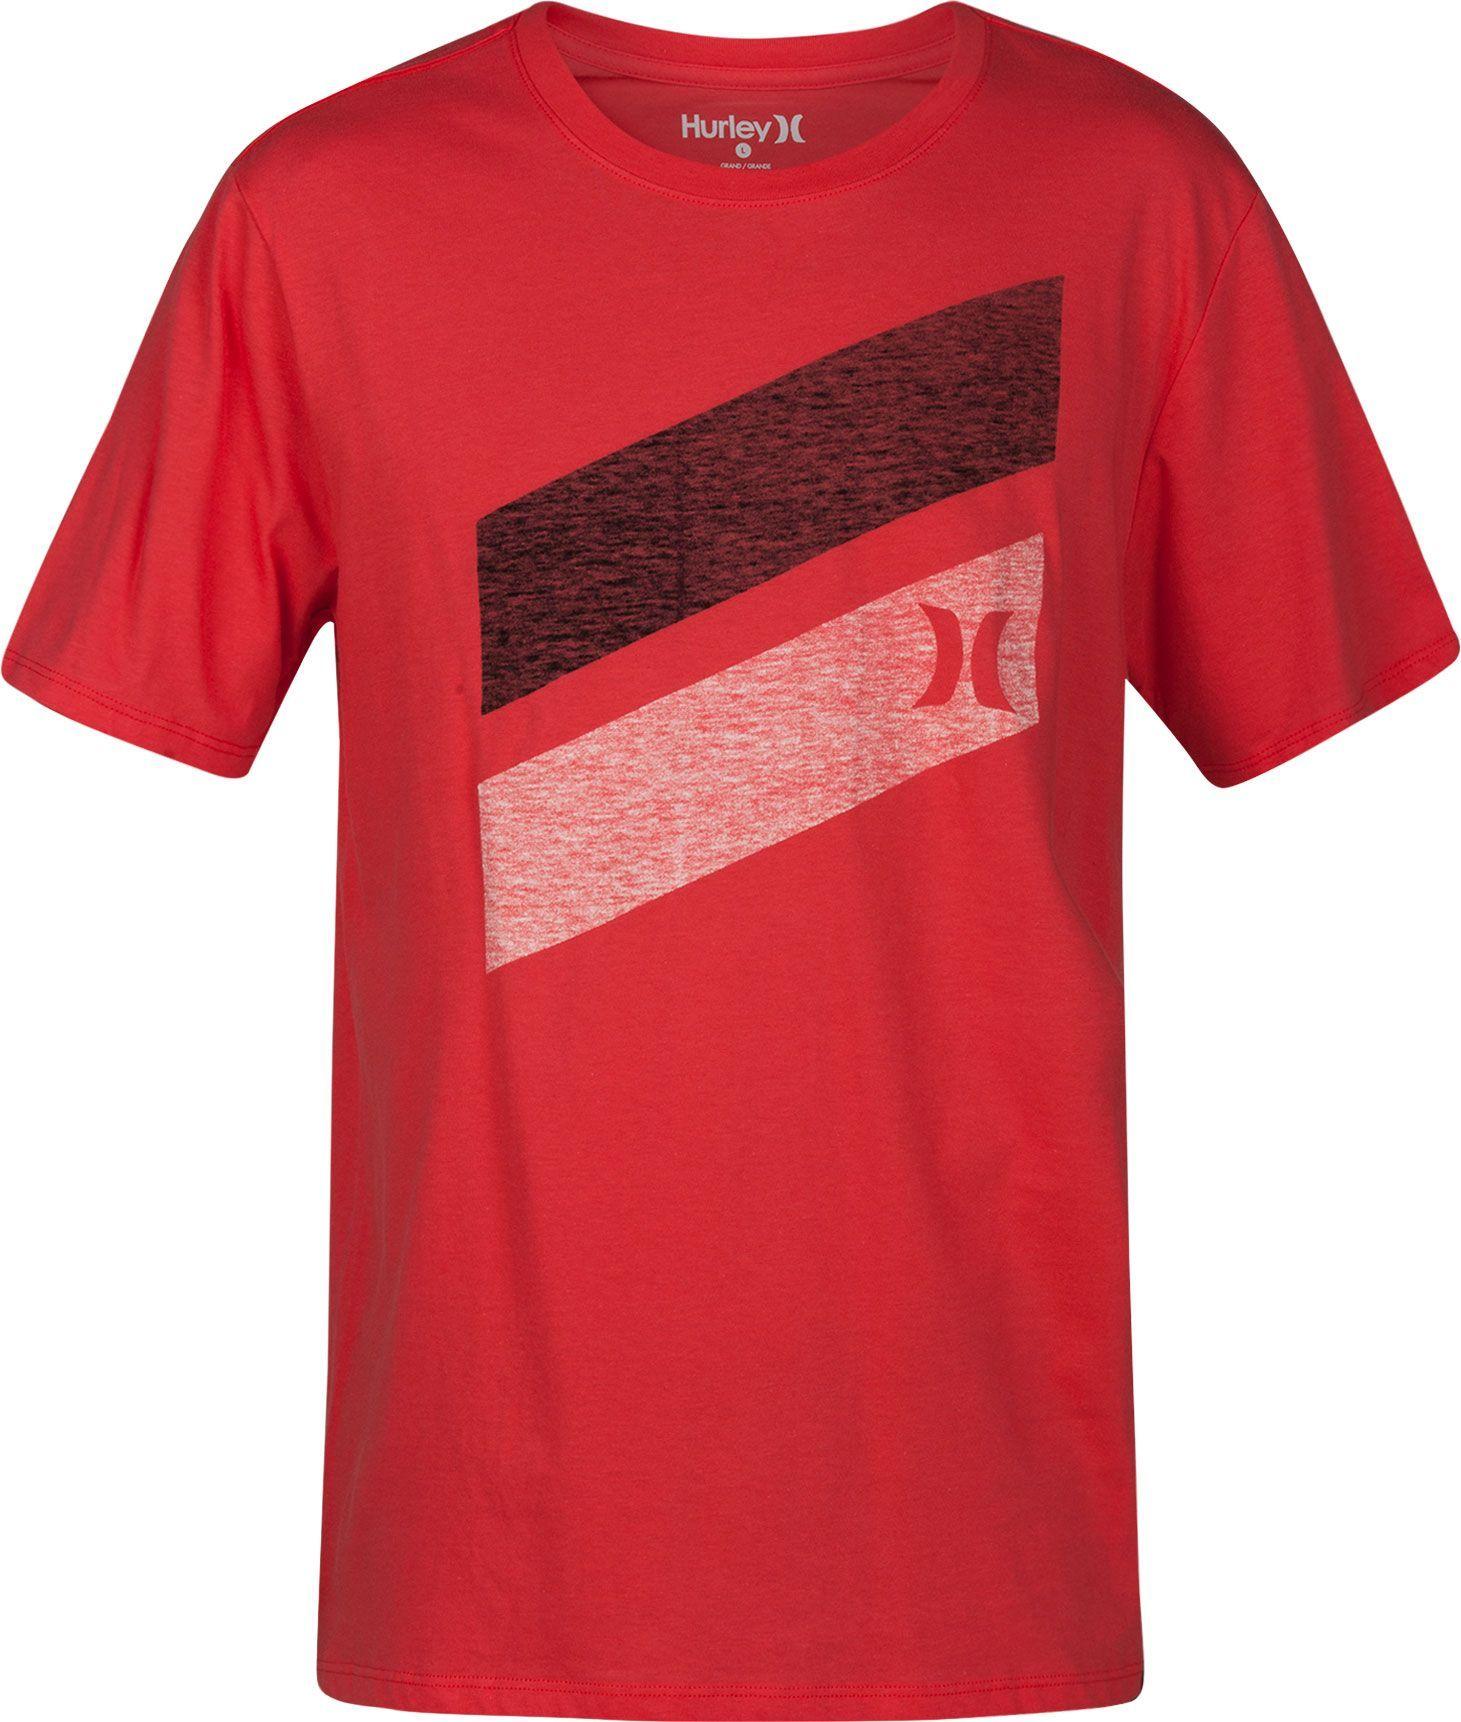 fff4864a3f Hurley Men's Icon Slash Push Through T-Shirt | Products | Hurley ...